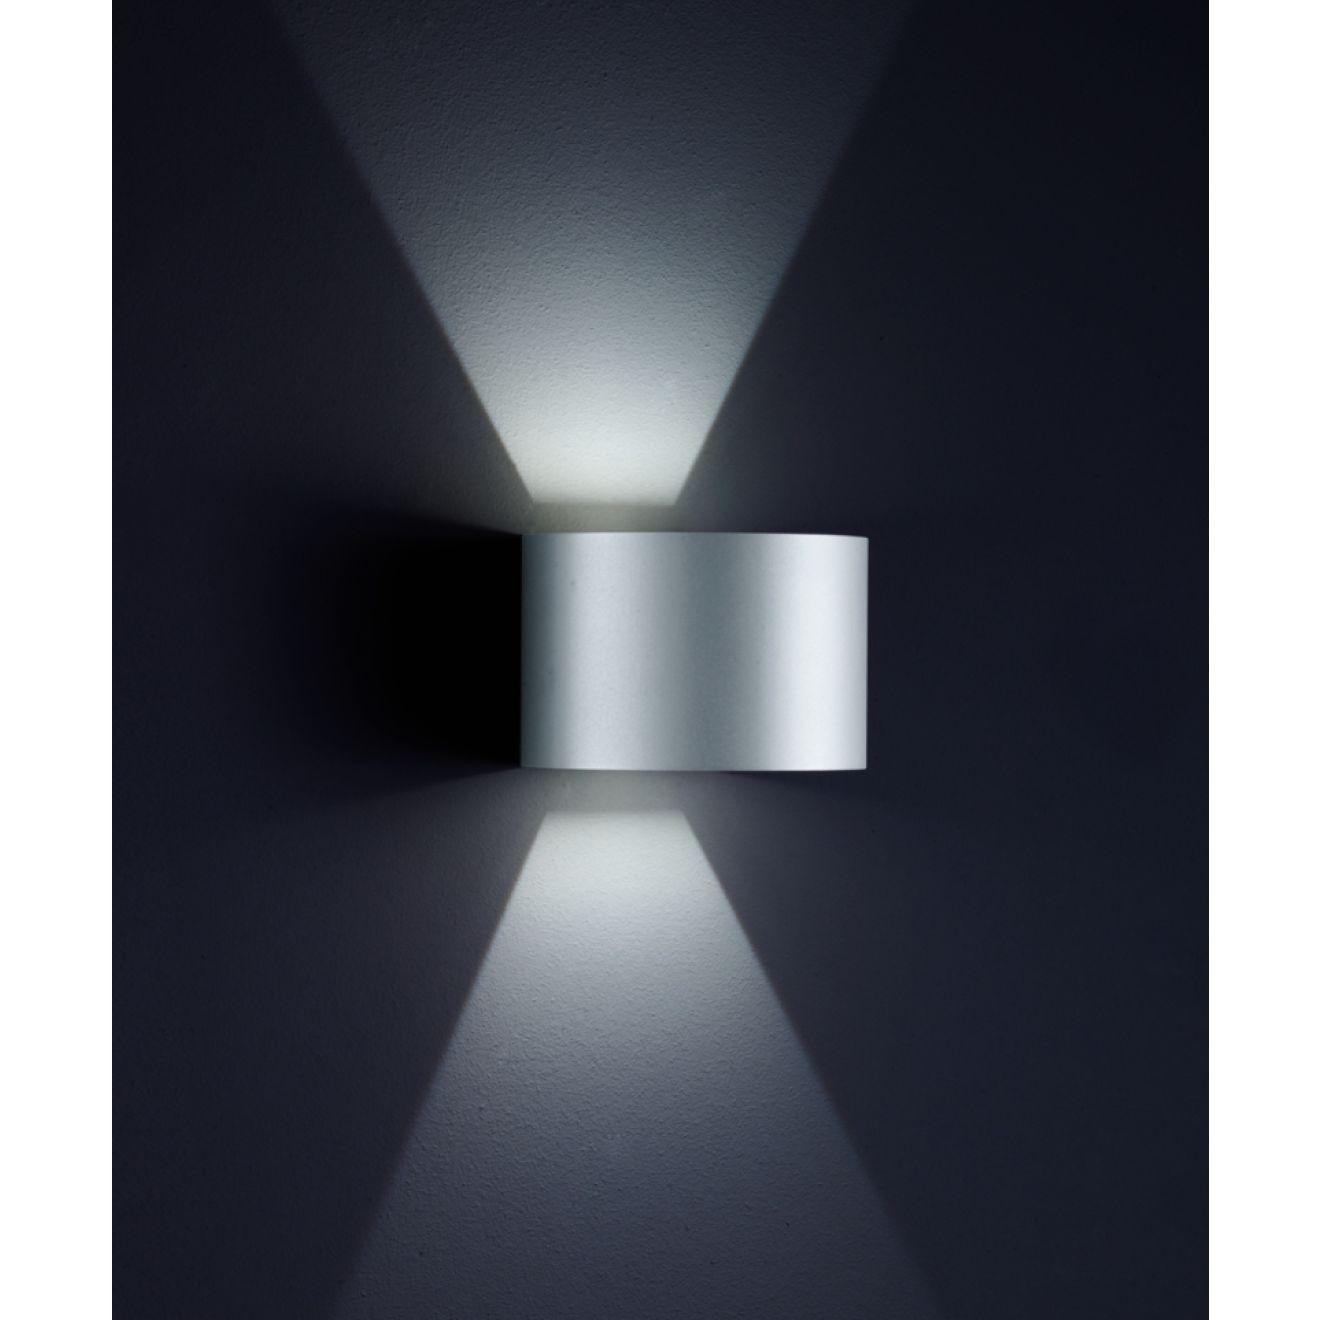 helestra siri44 aussen wandleuchte. Black Bedroom Furniture Sets. Home Design Ideas